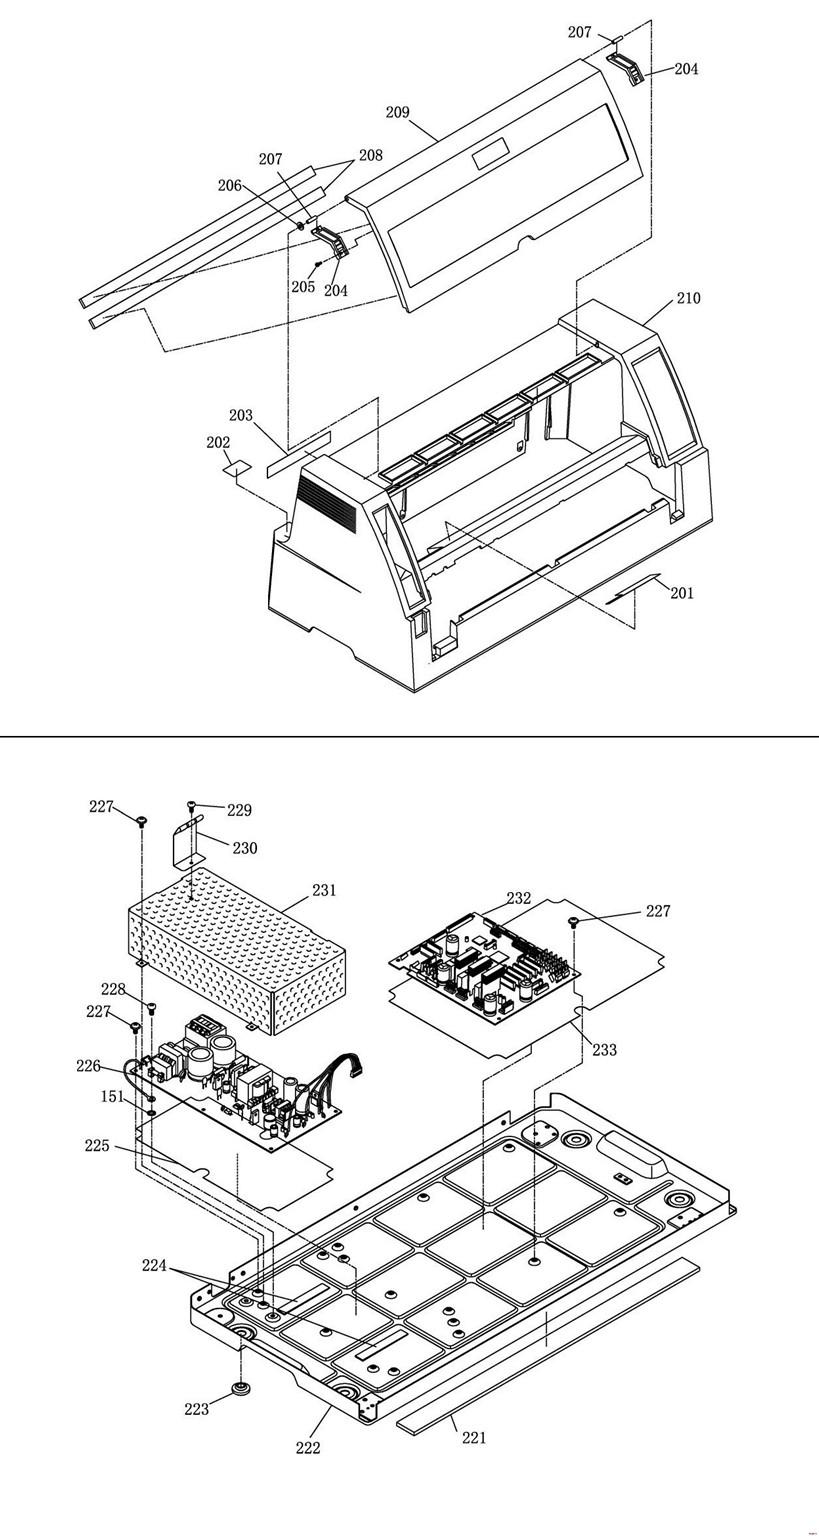 https://www.argecy.com/images/ACCEL-7450-Parts-3_cr.jpg